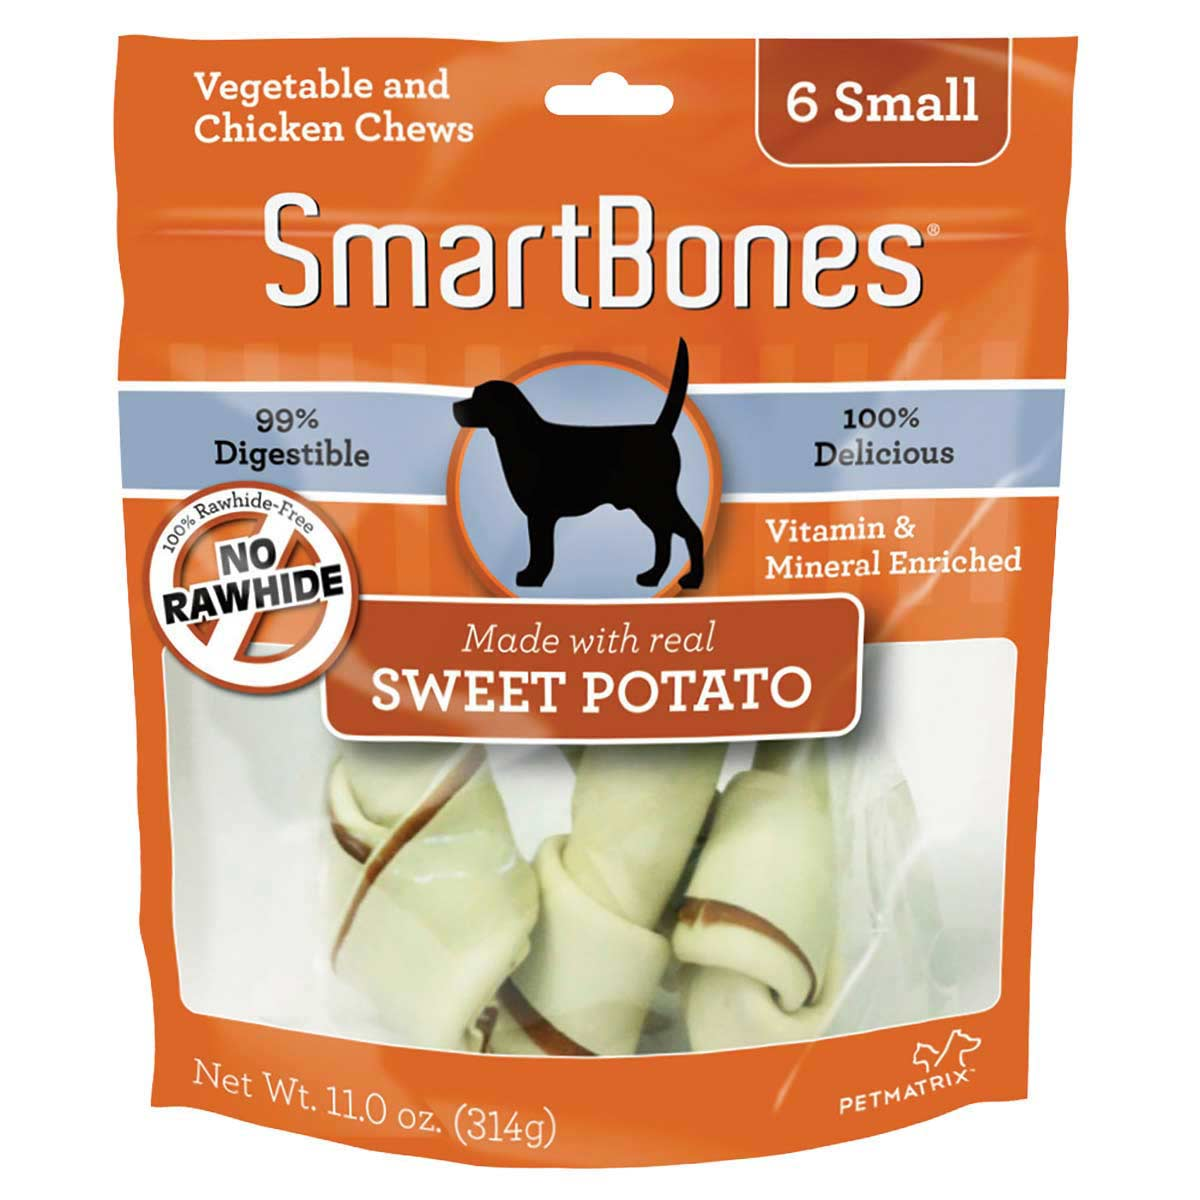 SmartBones Sweet Potato Small 6 Pack Dog Chews at Ryan's Pet Supplies